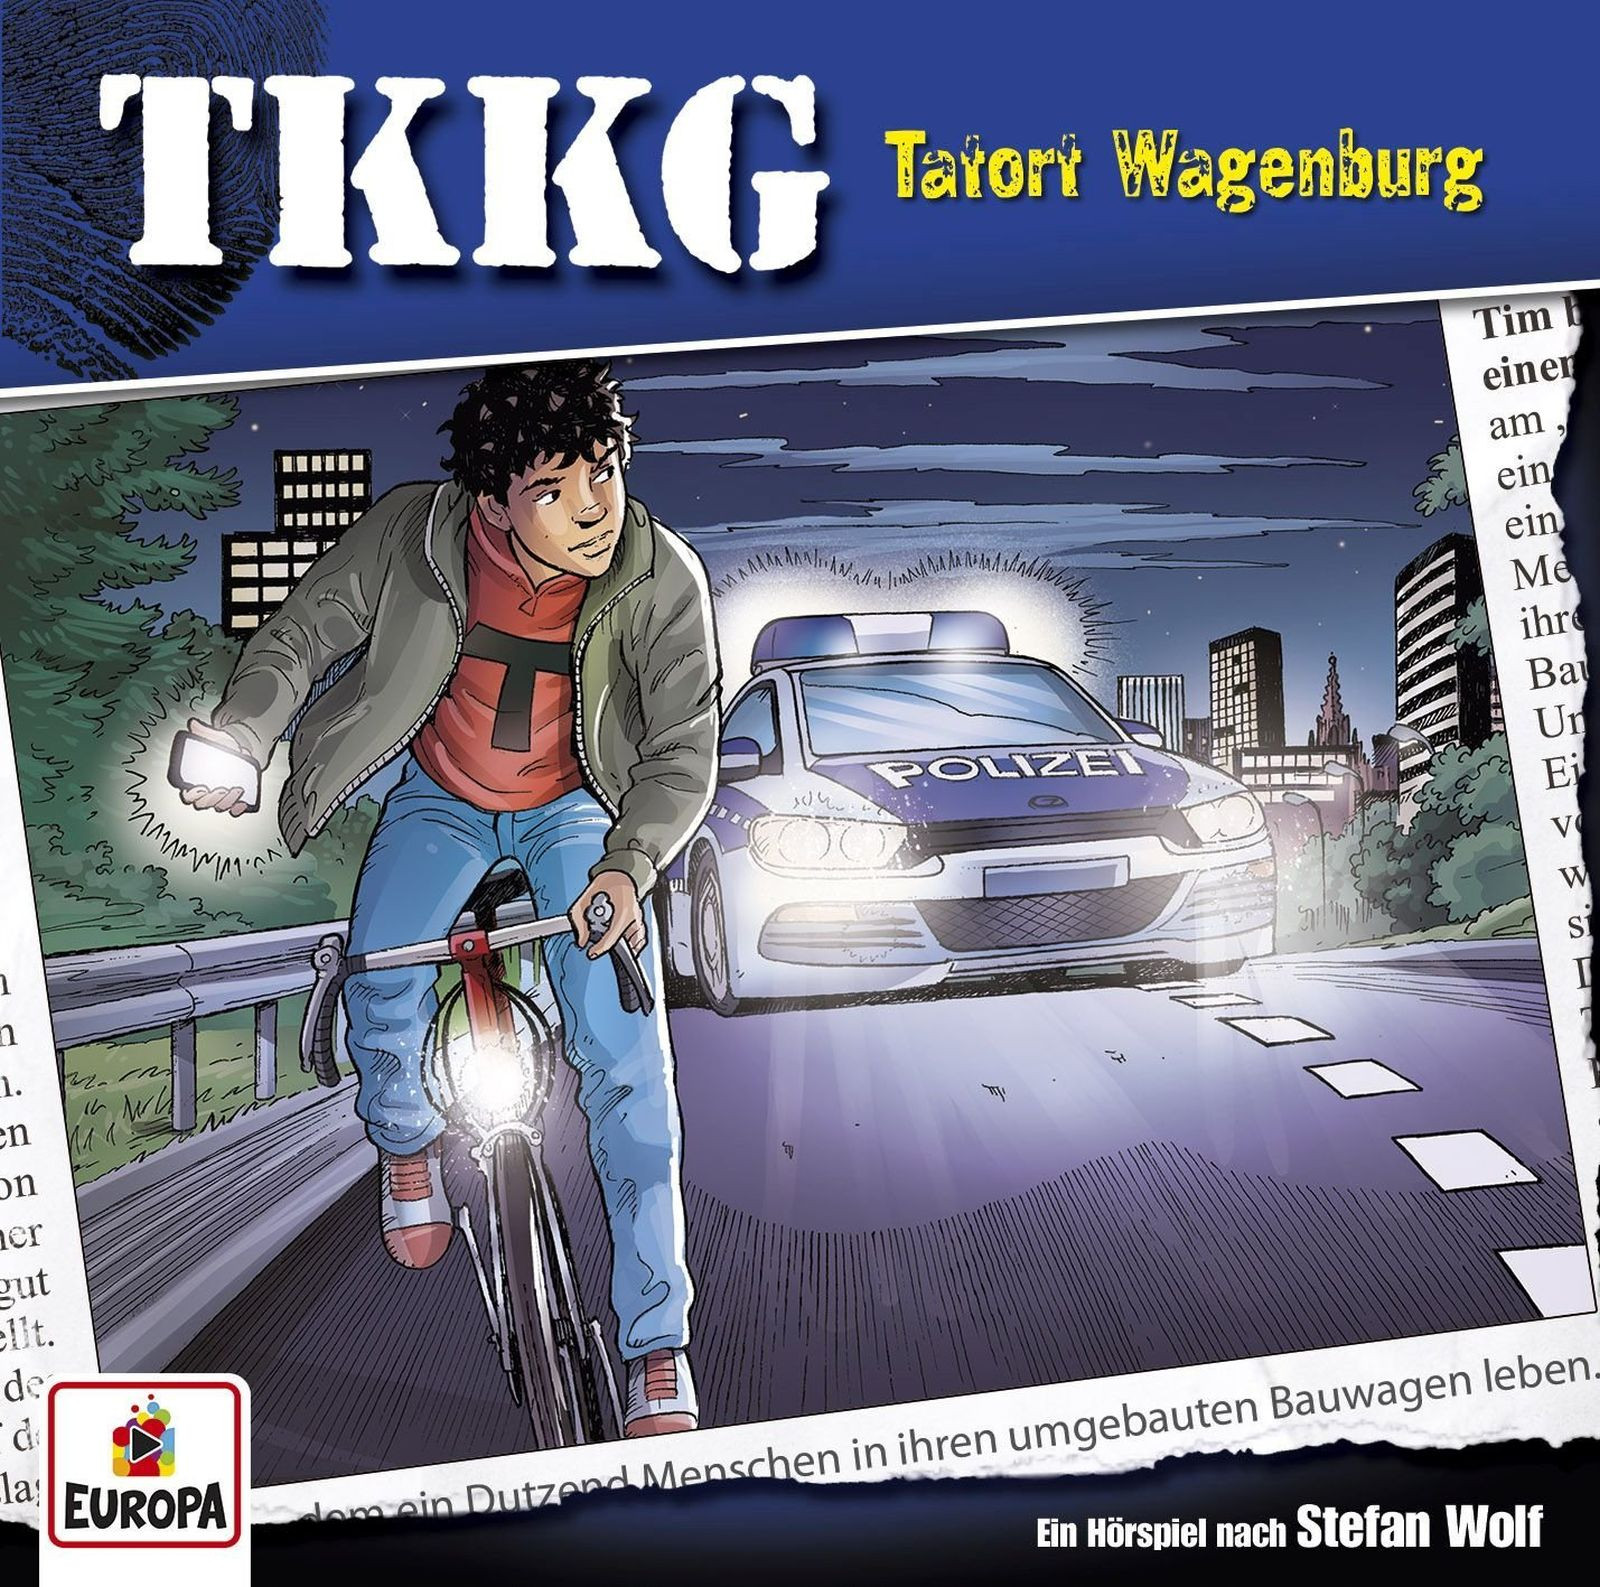 TKKG Folge 196 Tatort Wagenburg